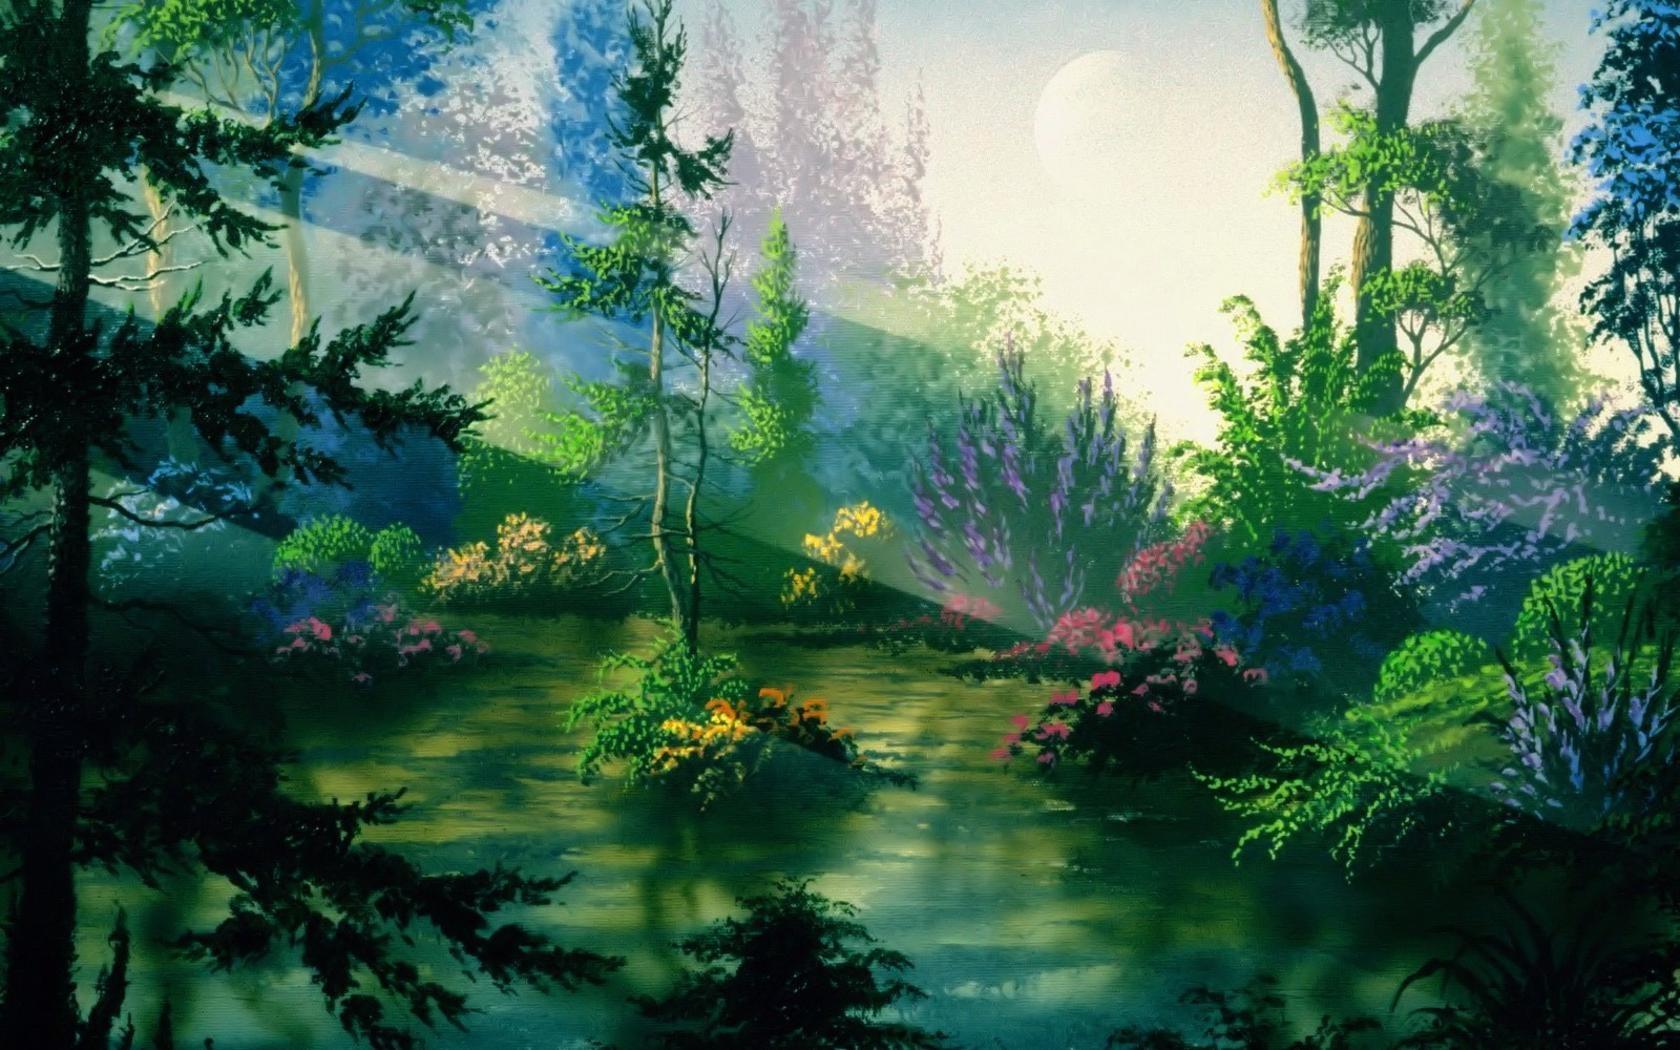 Wallpaper Forest Nature Scenery 2788 Wallpaper Wallpaper hd 1680x1050